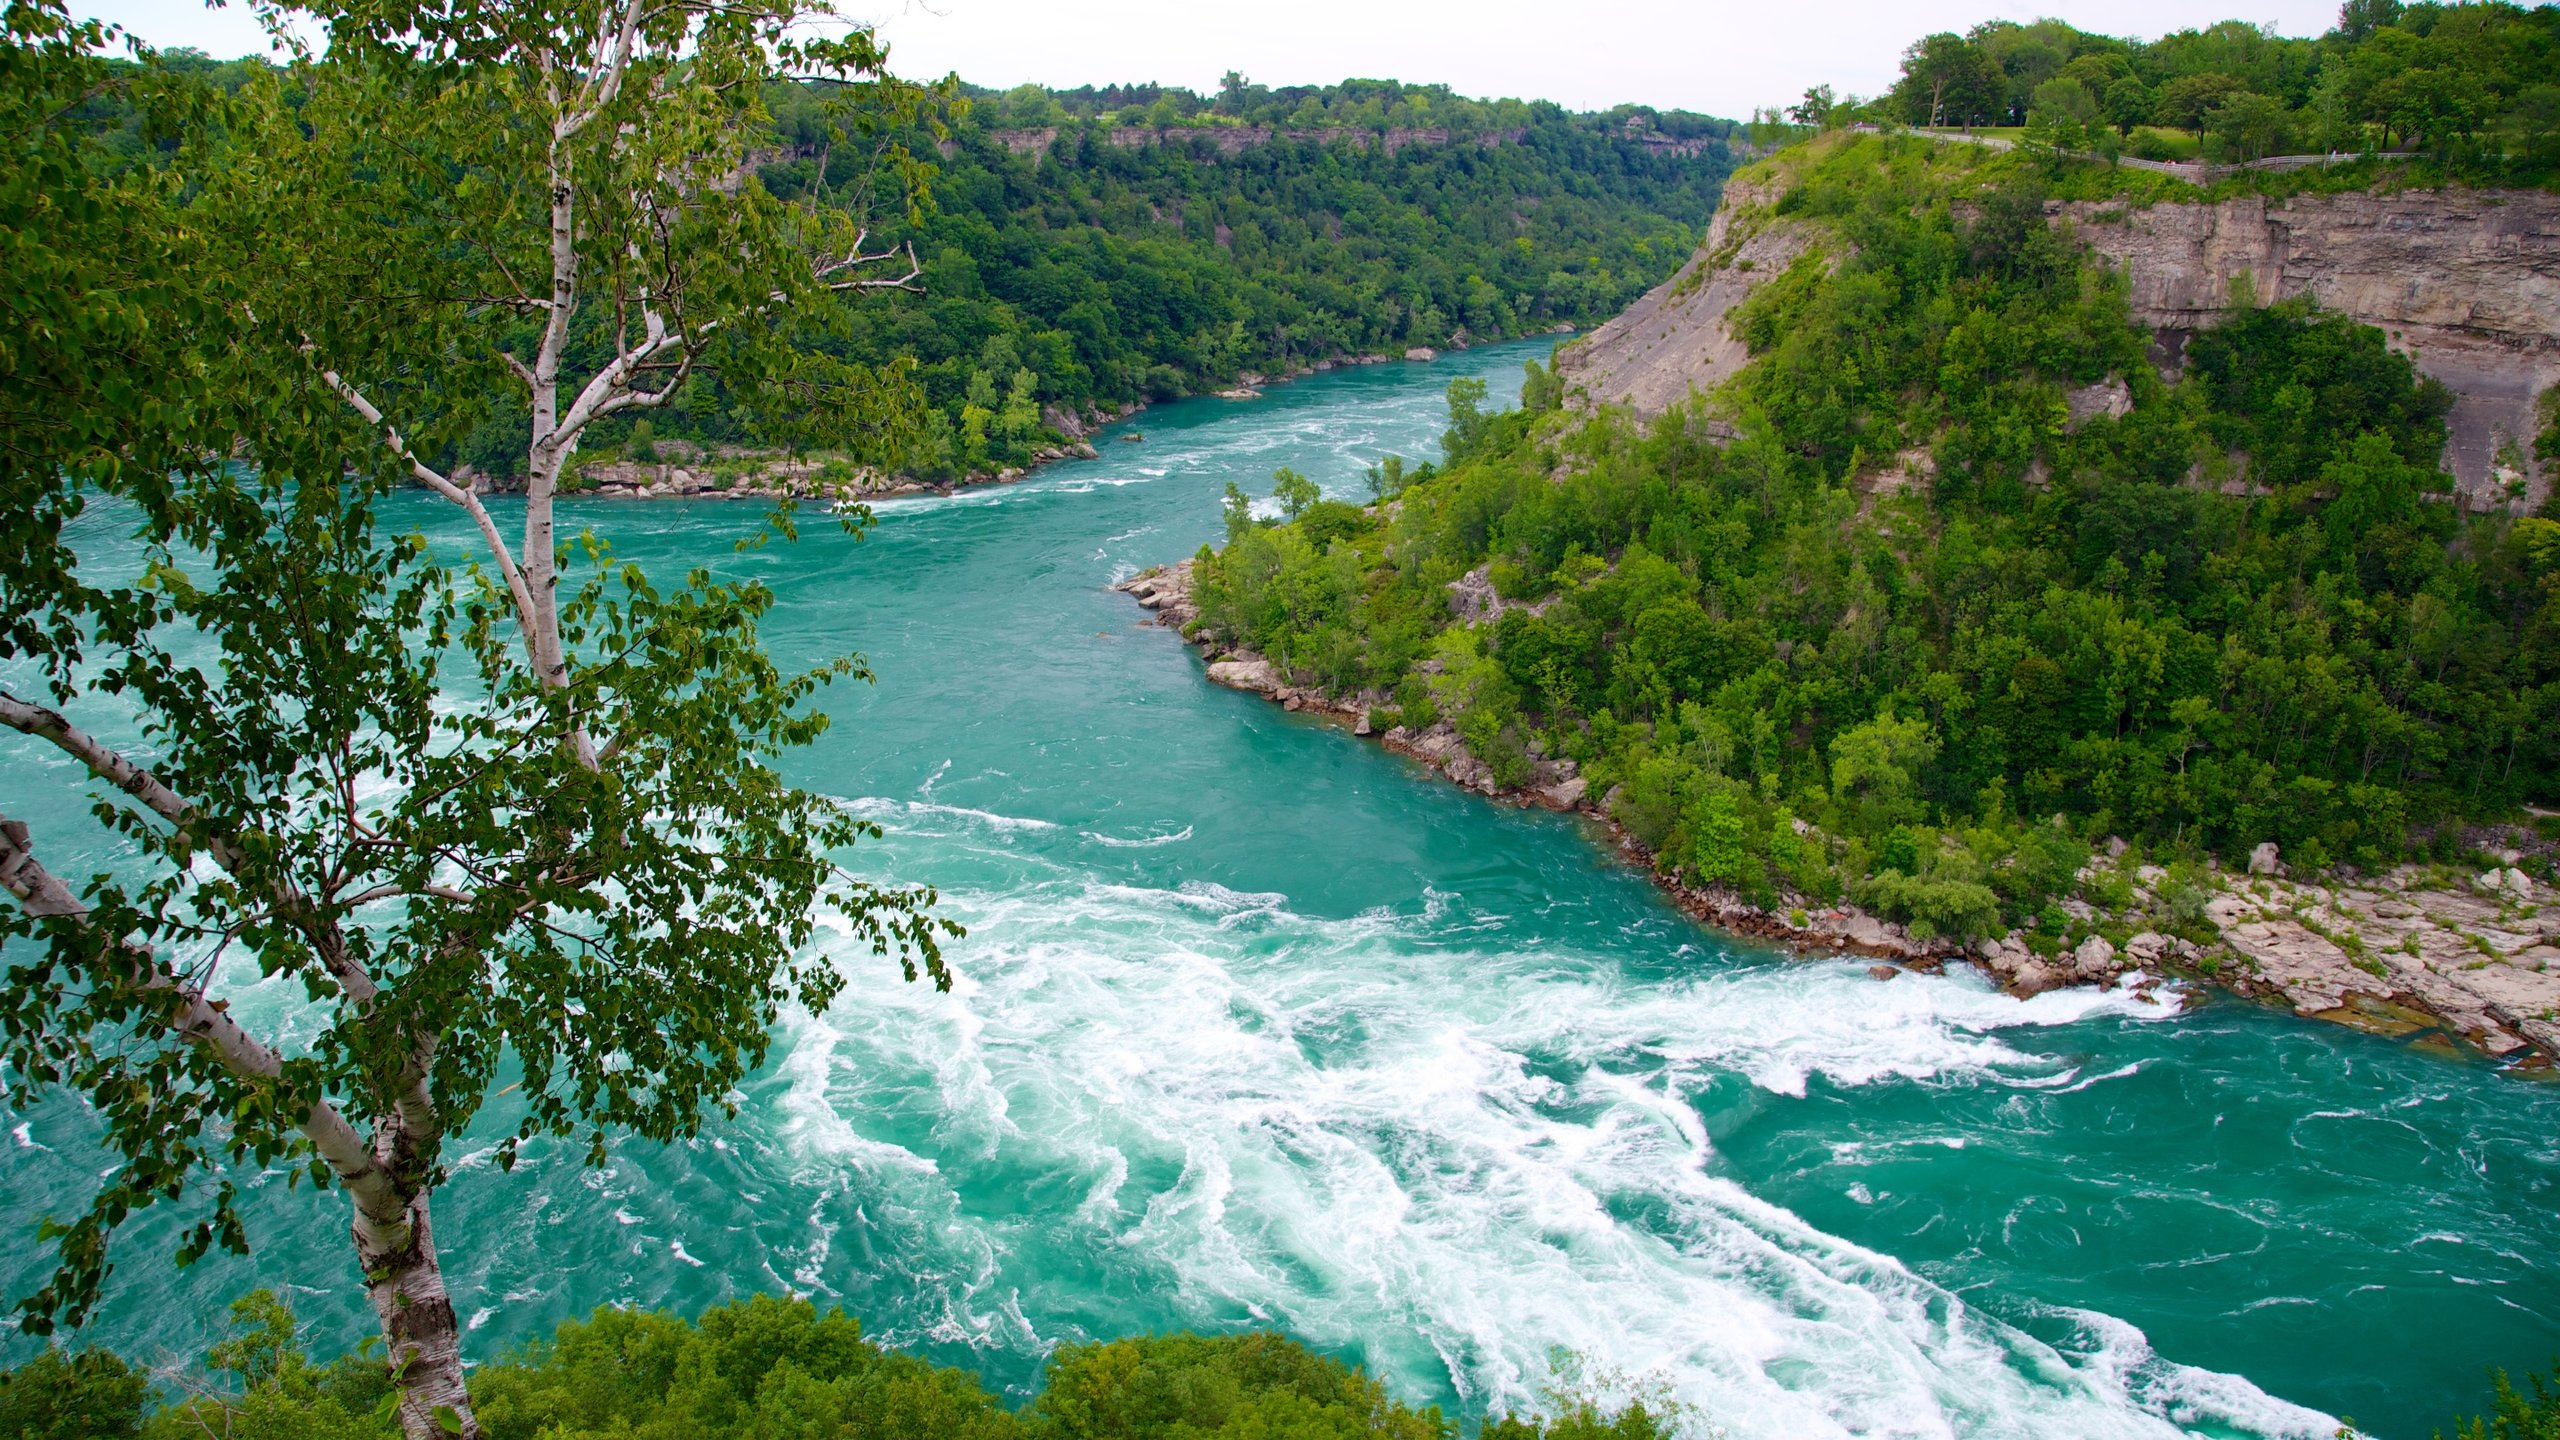 Whirlpool State Park, Niagara Falls, New York, United States of America